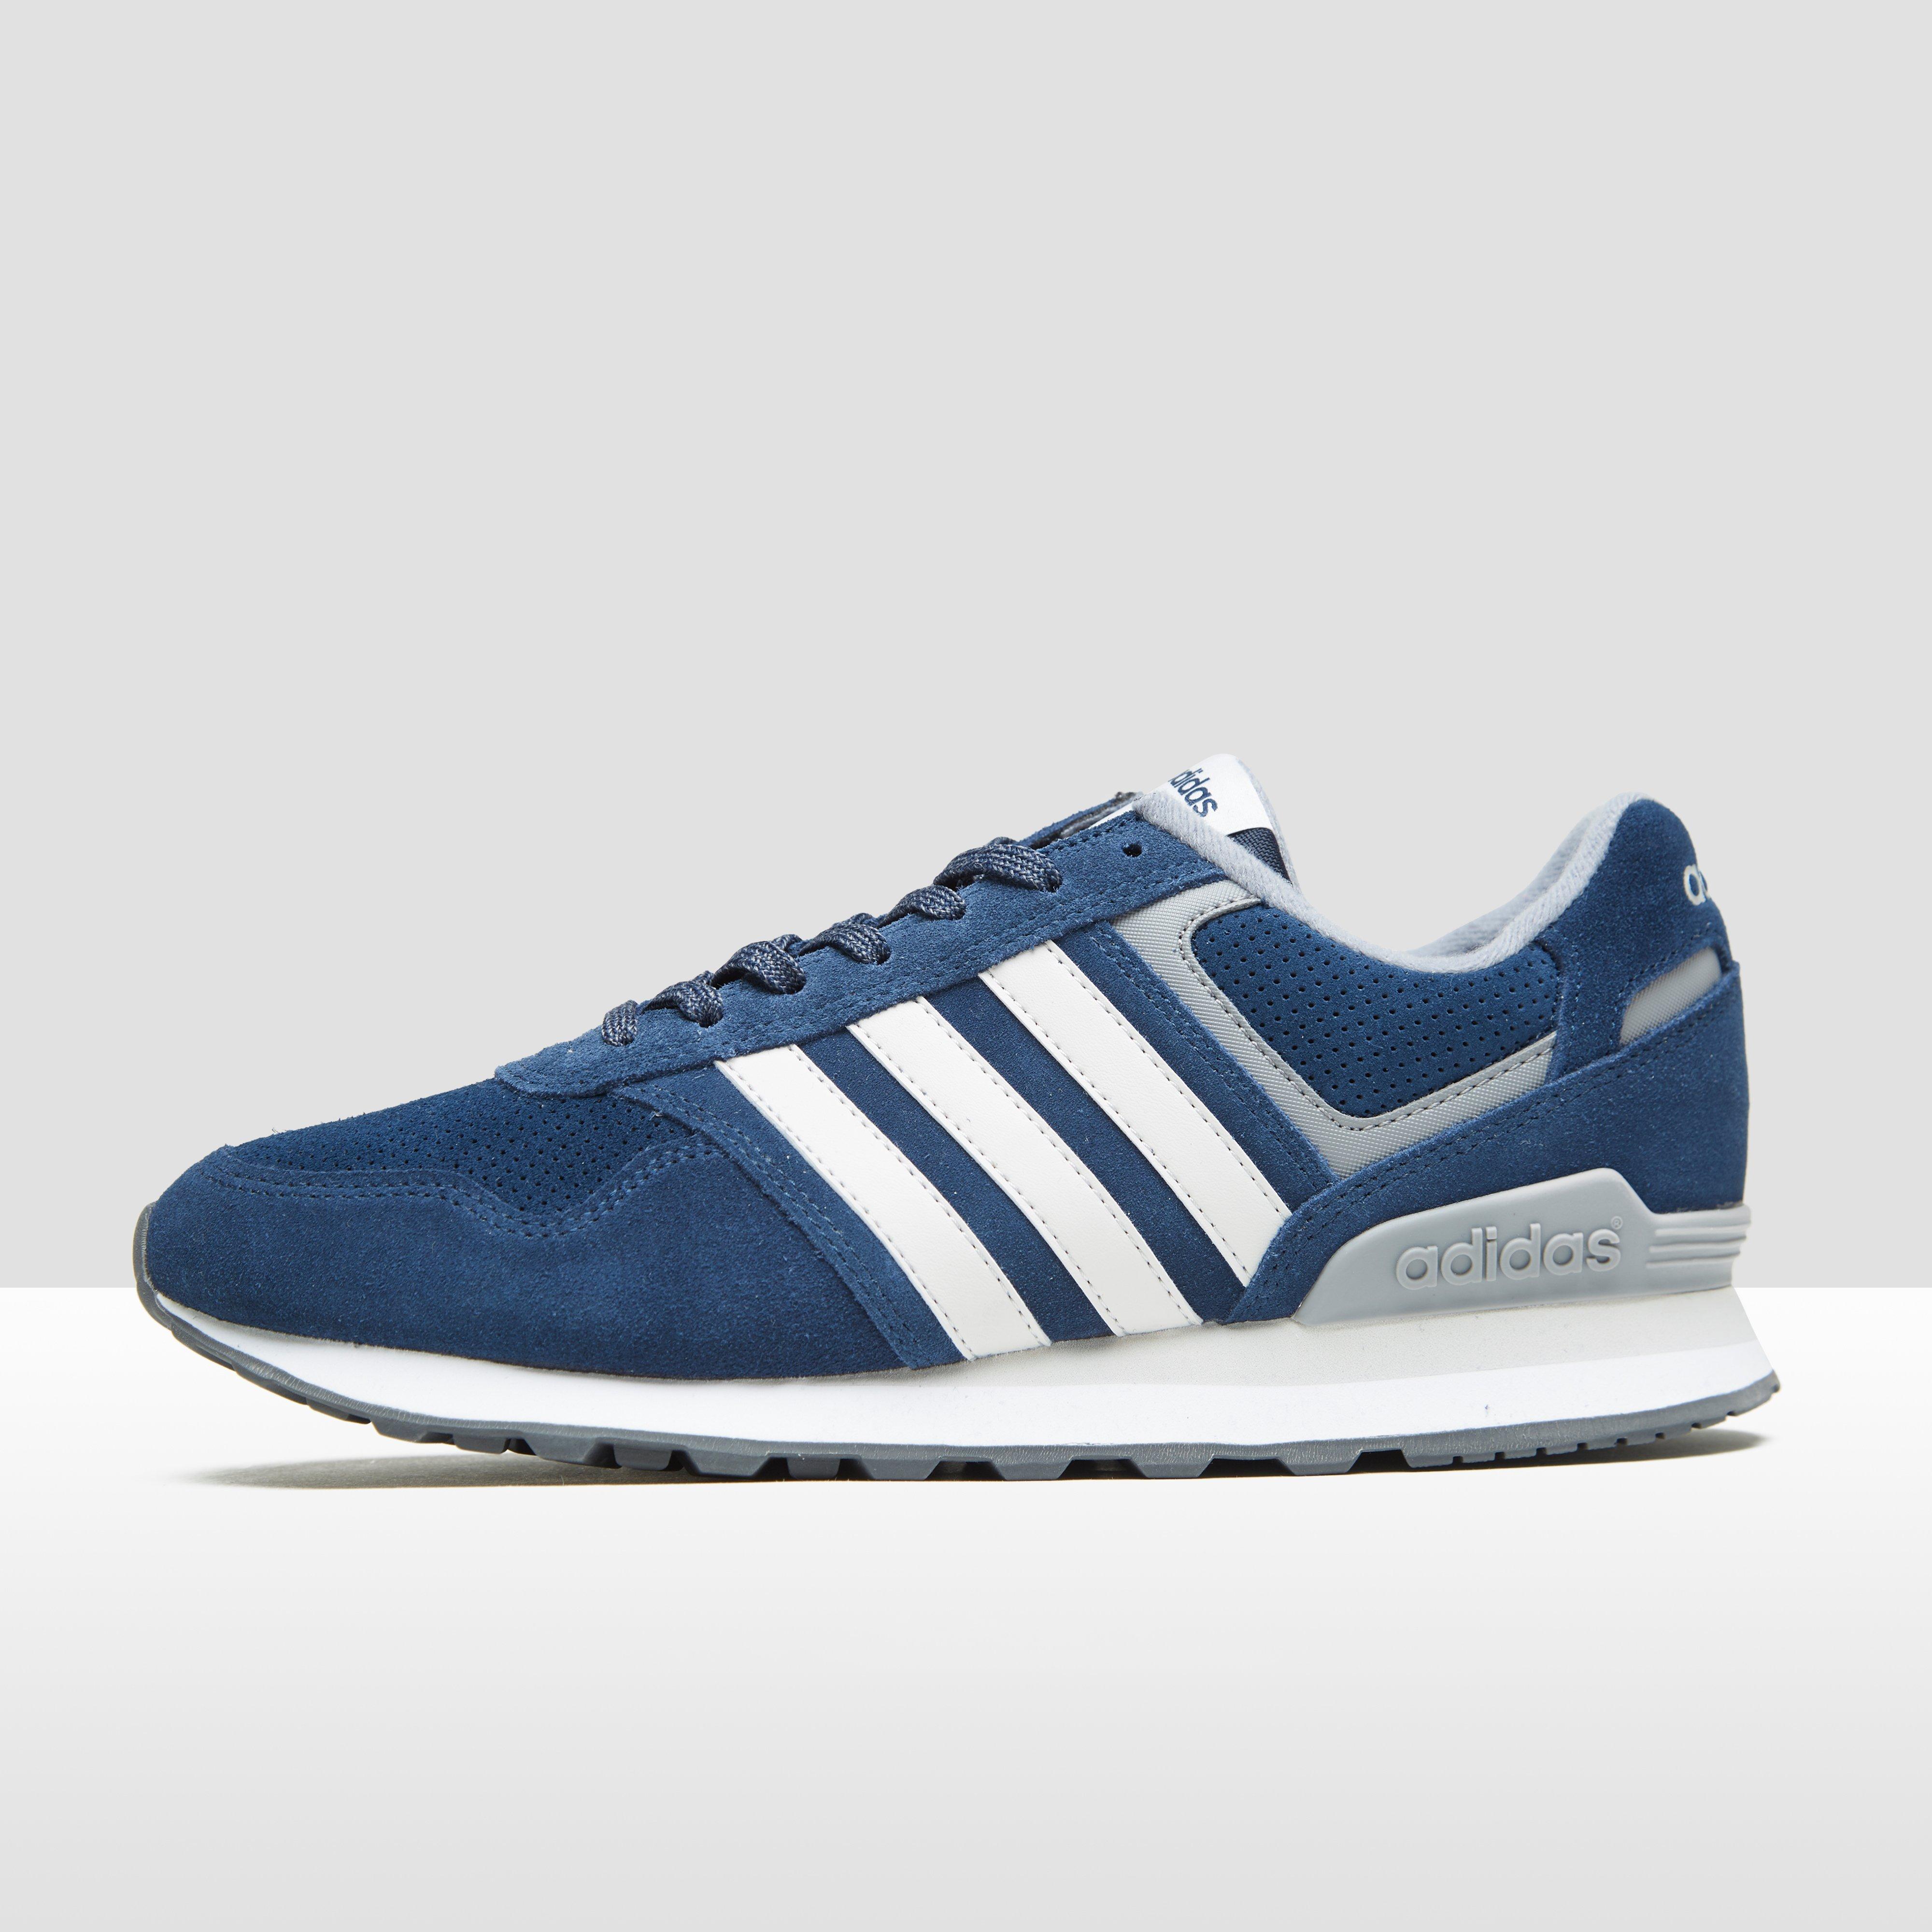 Sneakers HerenPerrysport Adidas Runeo 10k Blauw ARjL54